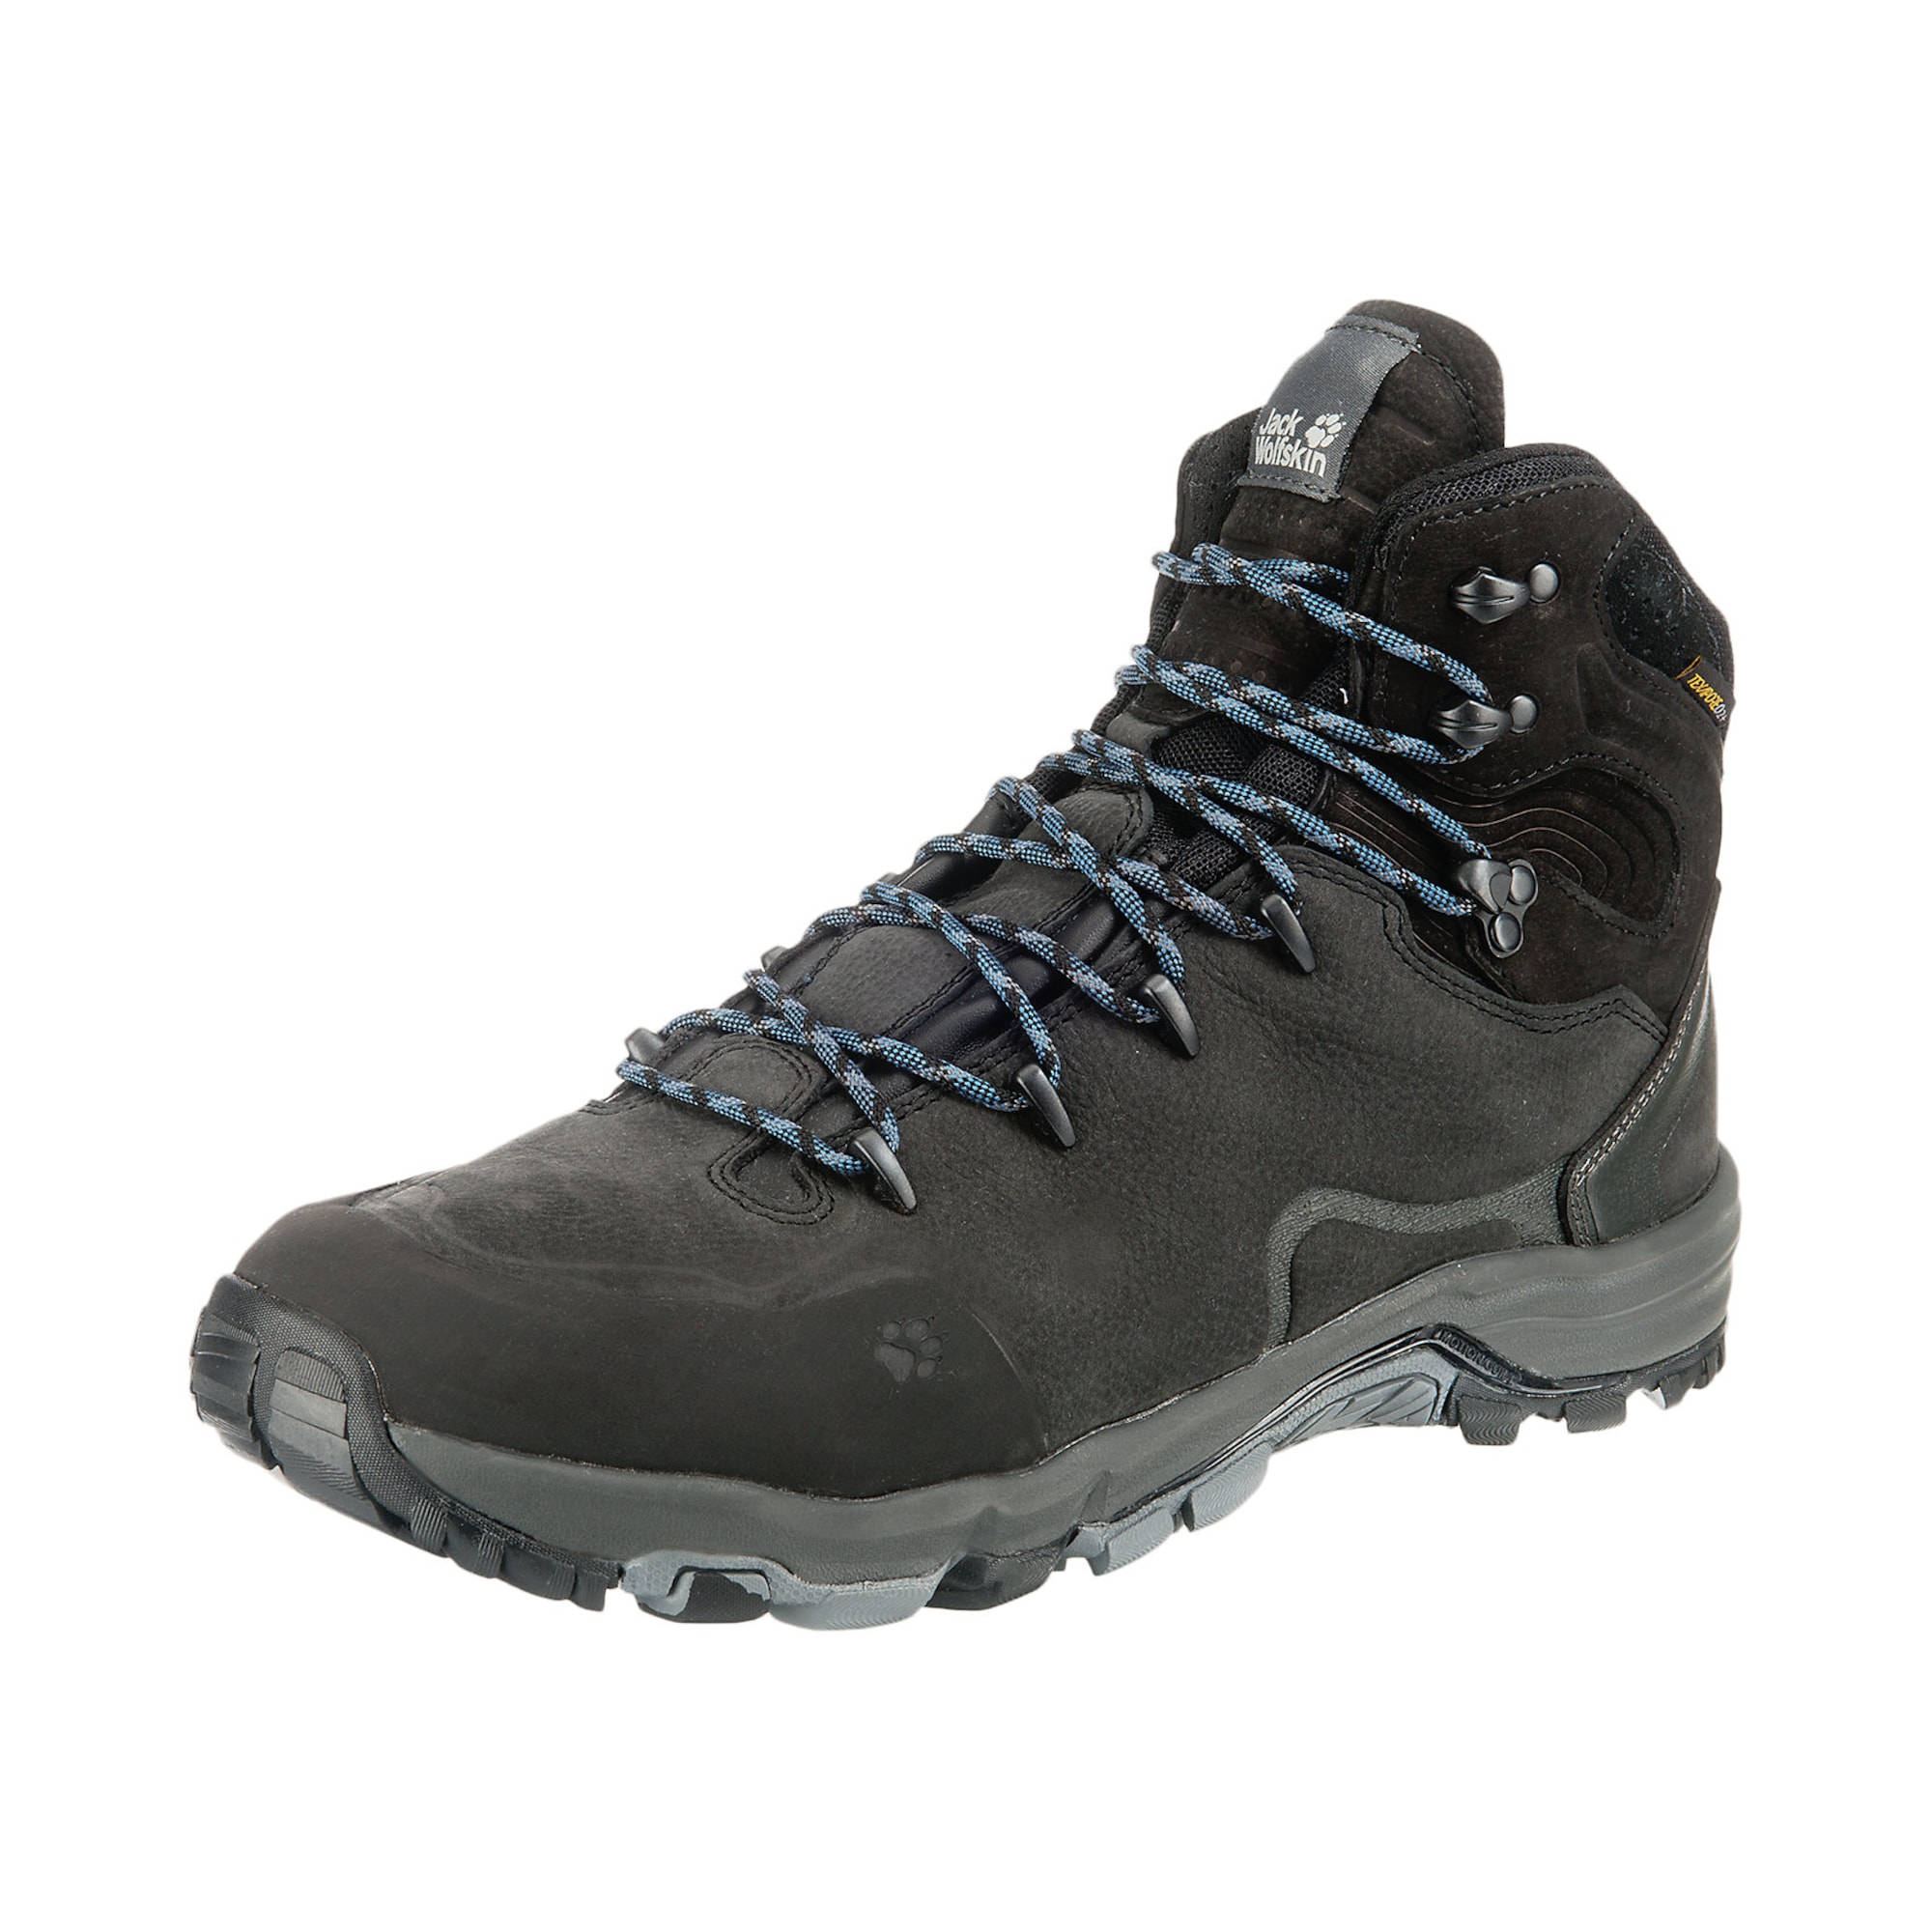 Trekkingstiefel 'Altiplano Prime Texapore Mid'   Schuhe > Outdoorschuhe > Trekkingschuhe   Jack Wolfskin